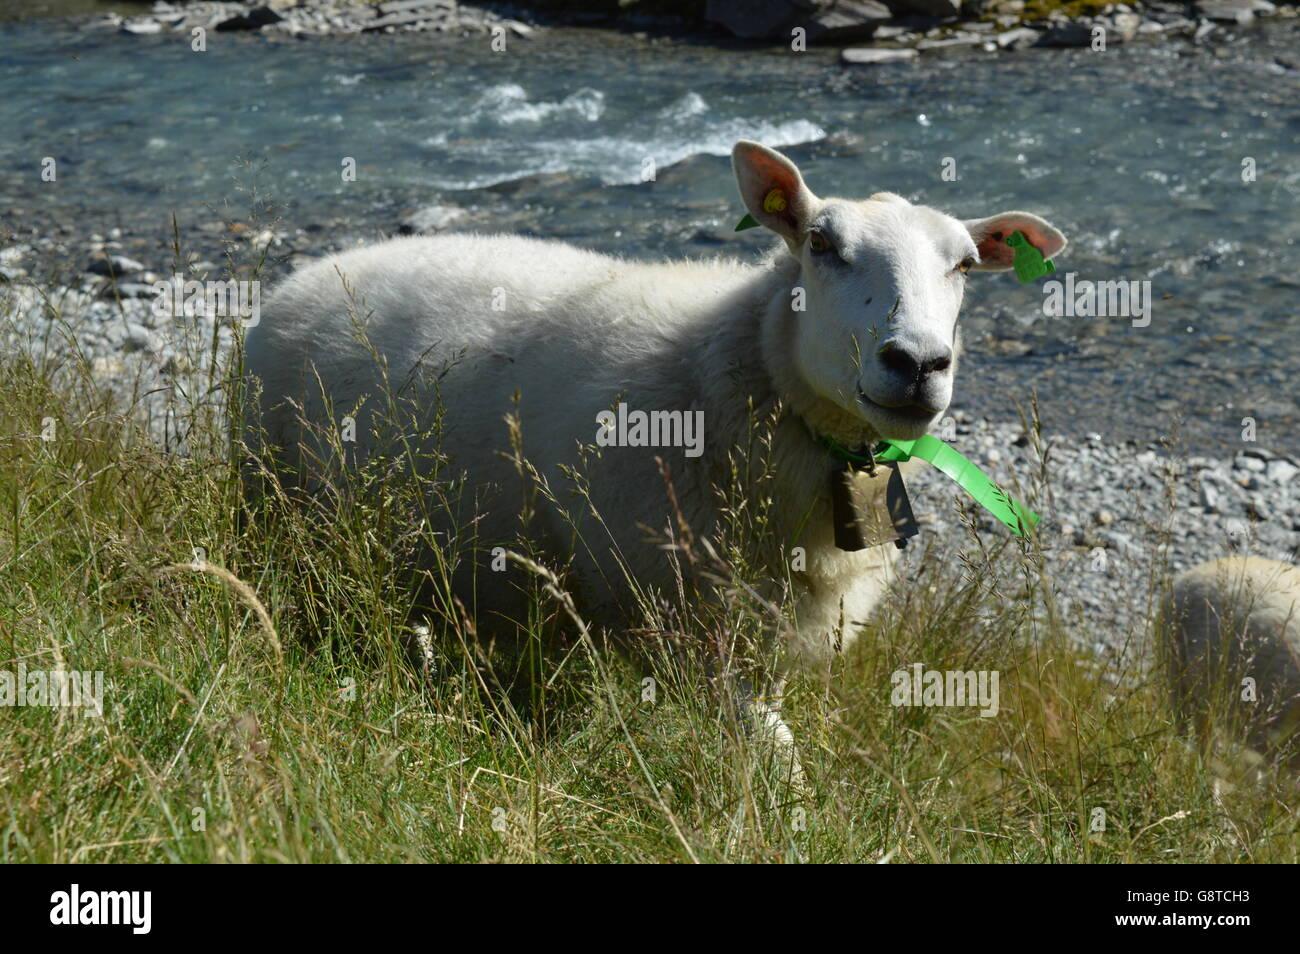 Lamb Norway Trollstigen - Stock Image